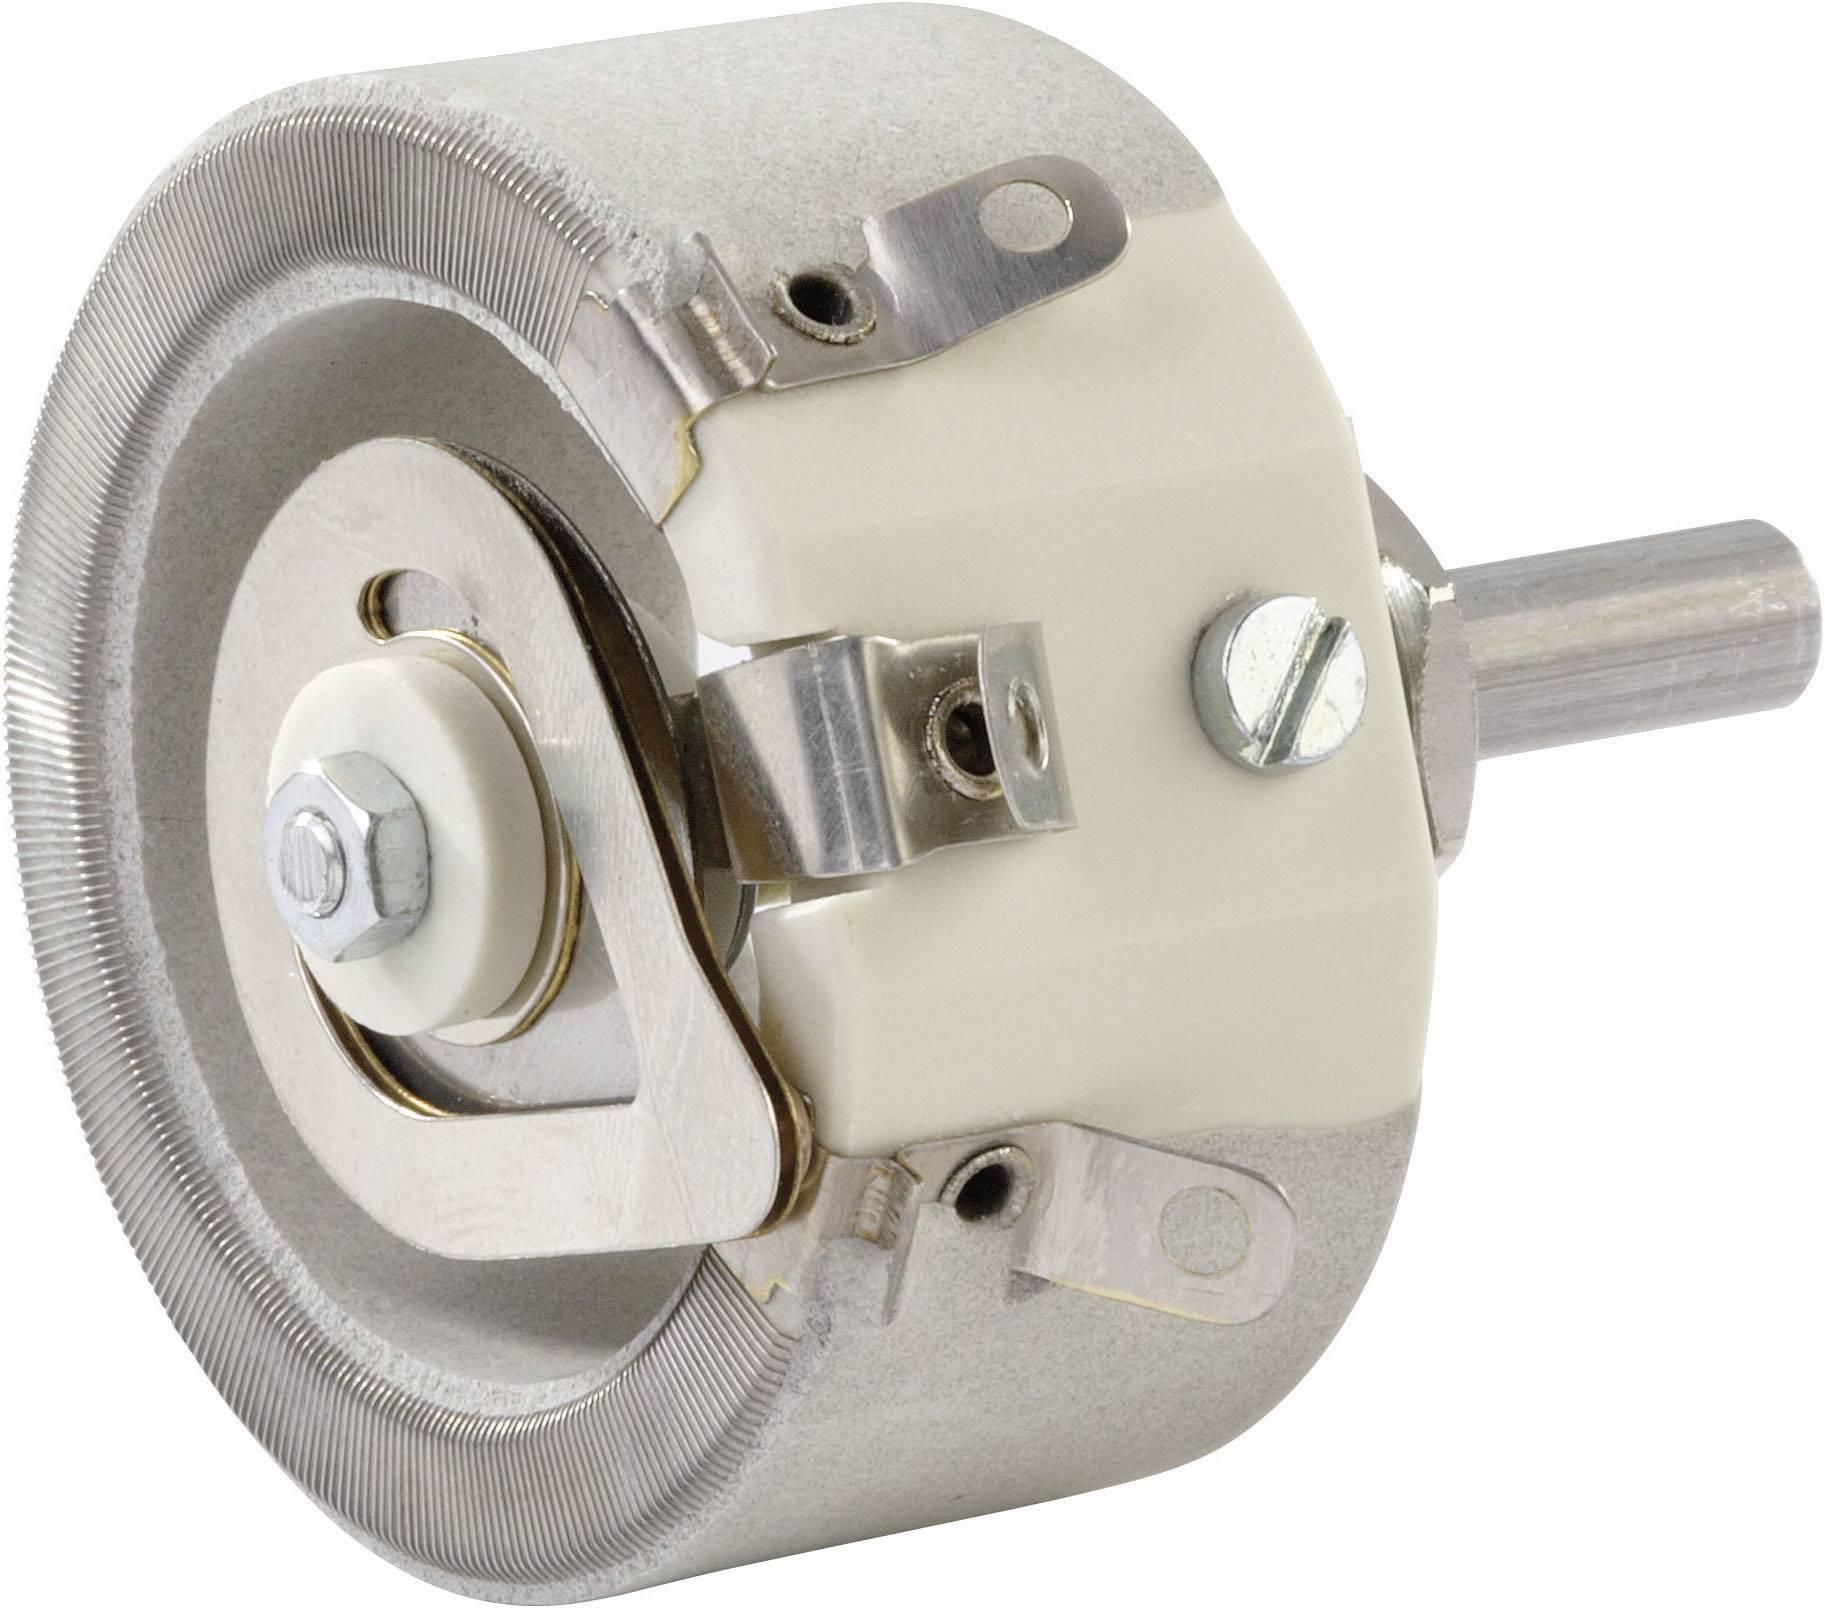 Drôtový potenciometer mono TT Electronics AB 3191003000 3191003000, 10 W, 100 Ohm, 1 ks